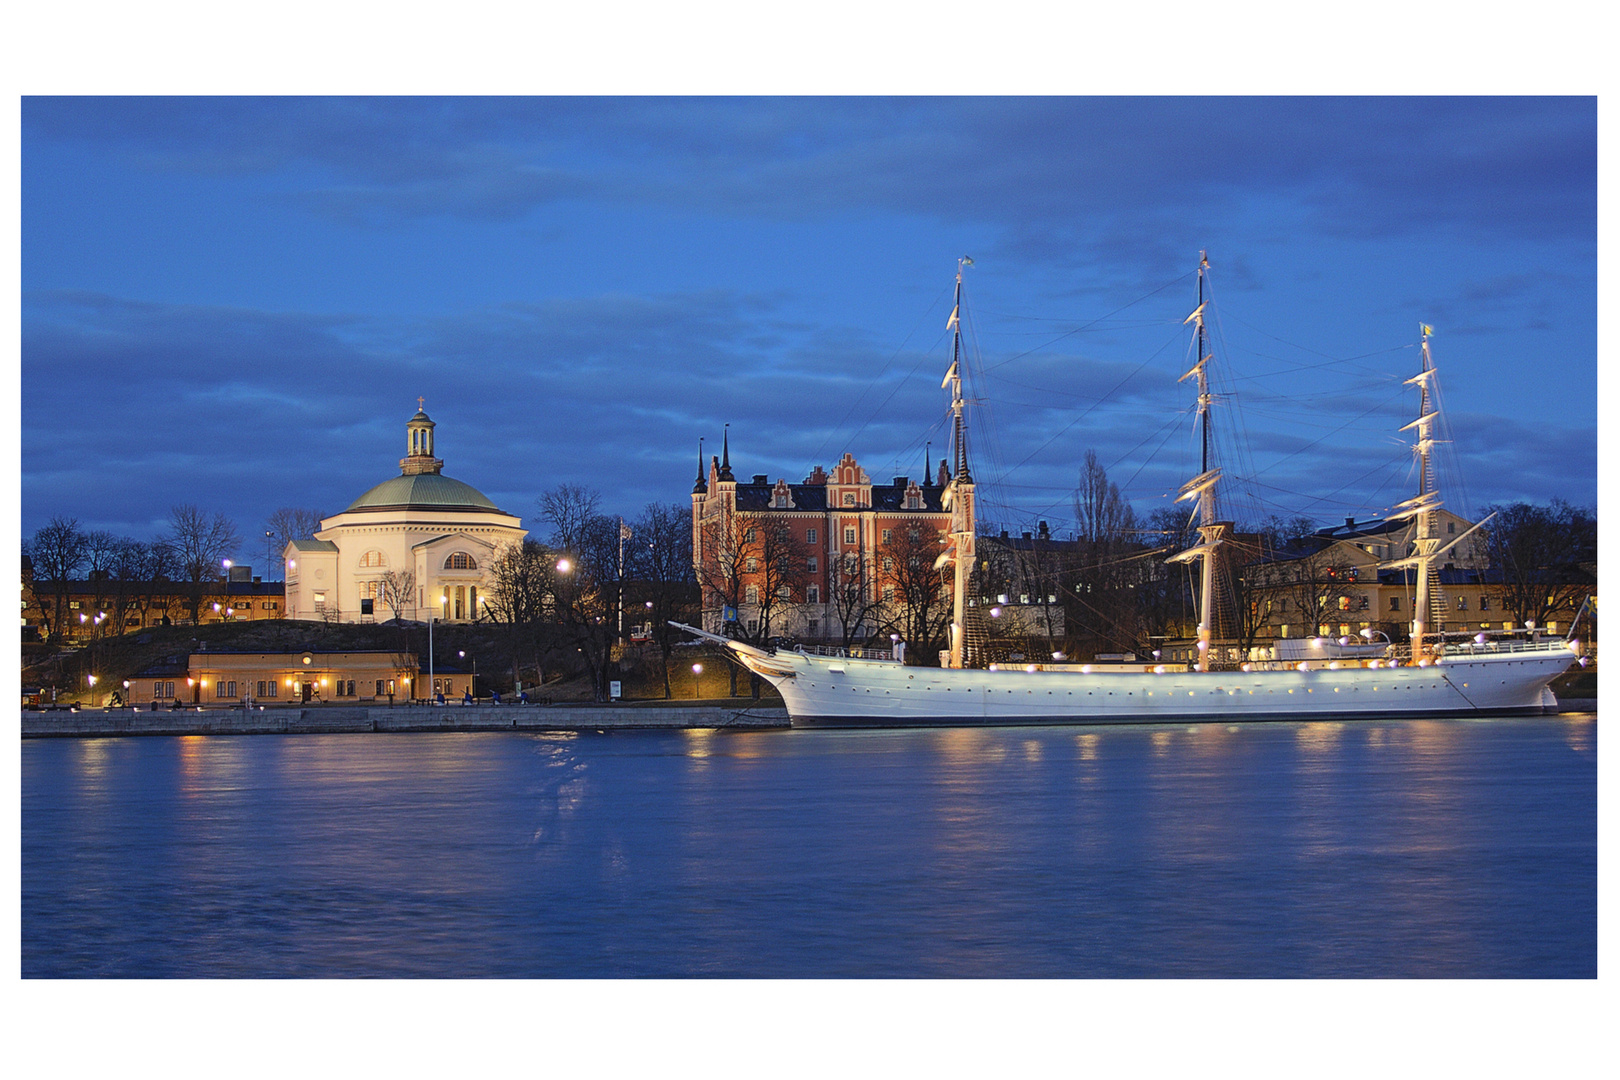 Segelschiff in Stockholm